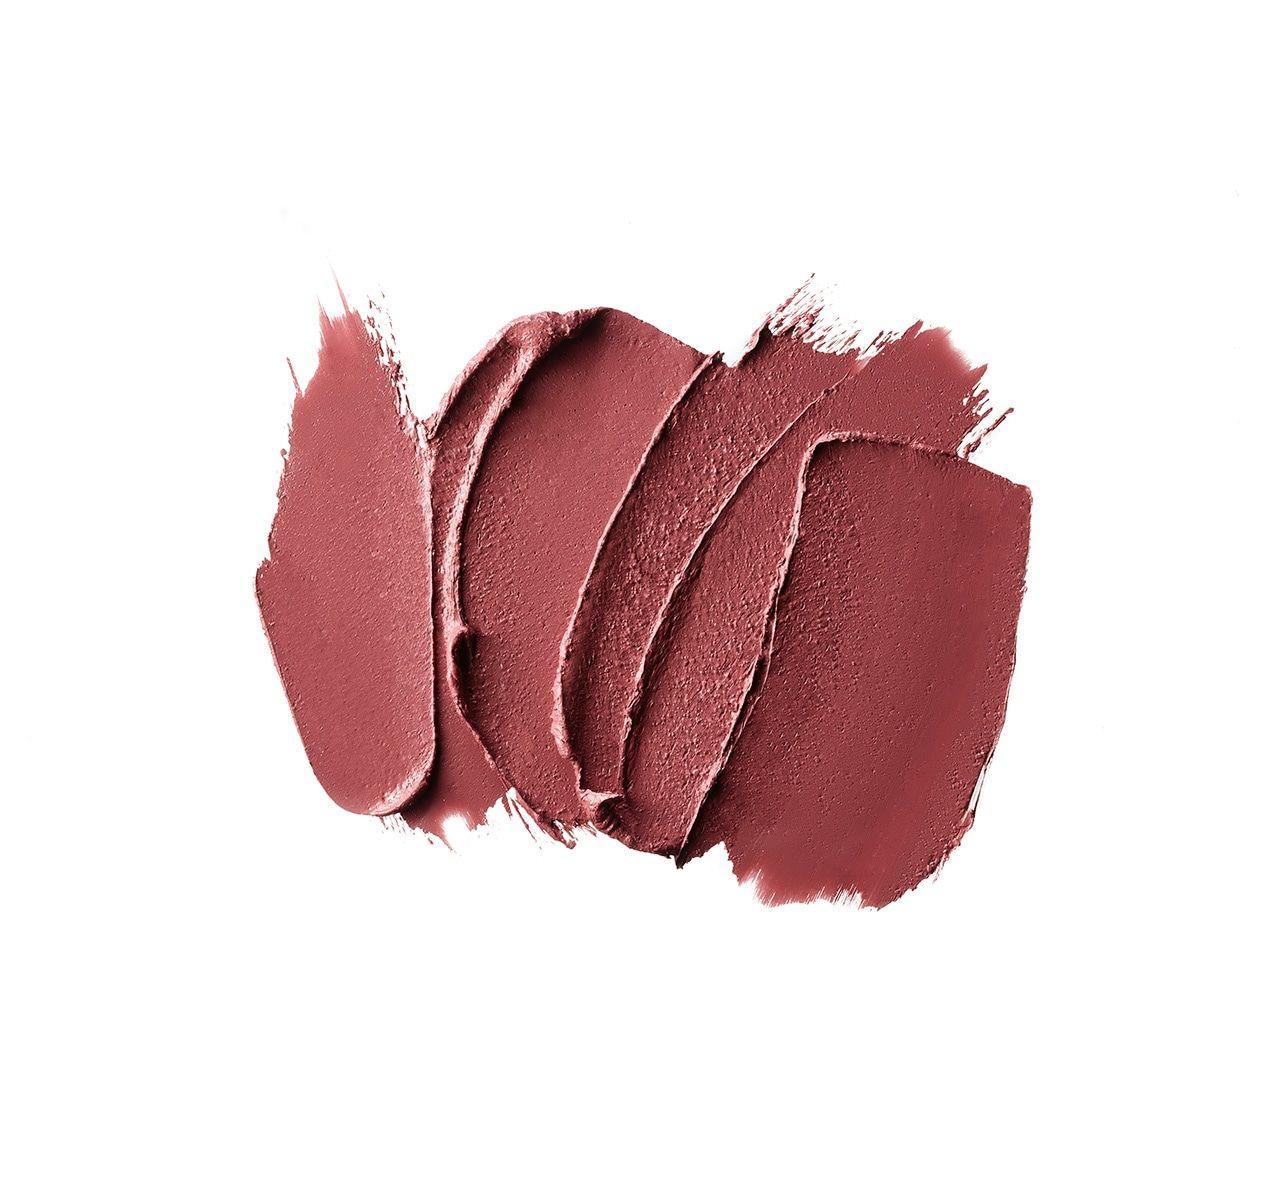 Mac Matte Lipstick Mac Cosmetics Official Site Mac Matte Lipstick Matte Lipstick Mac Cosmetics Canada